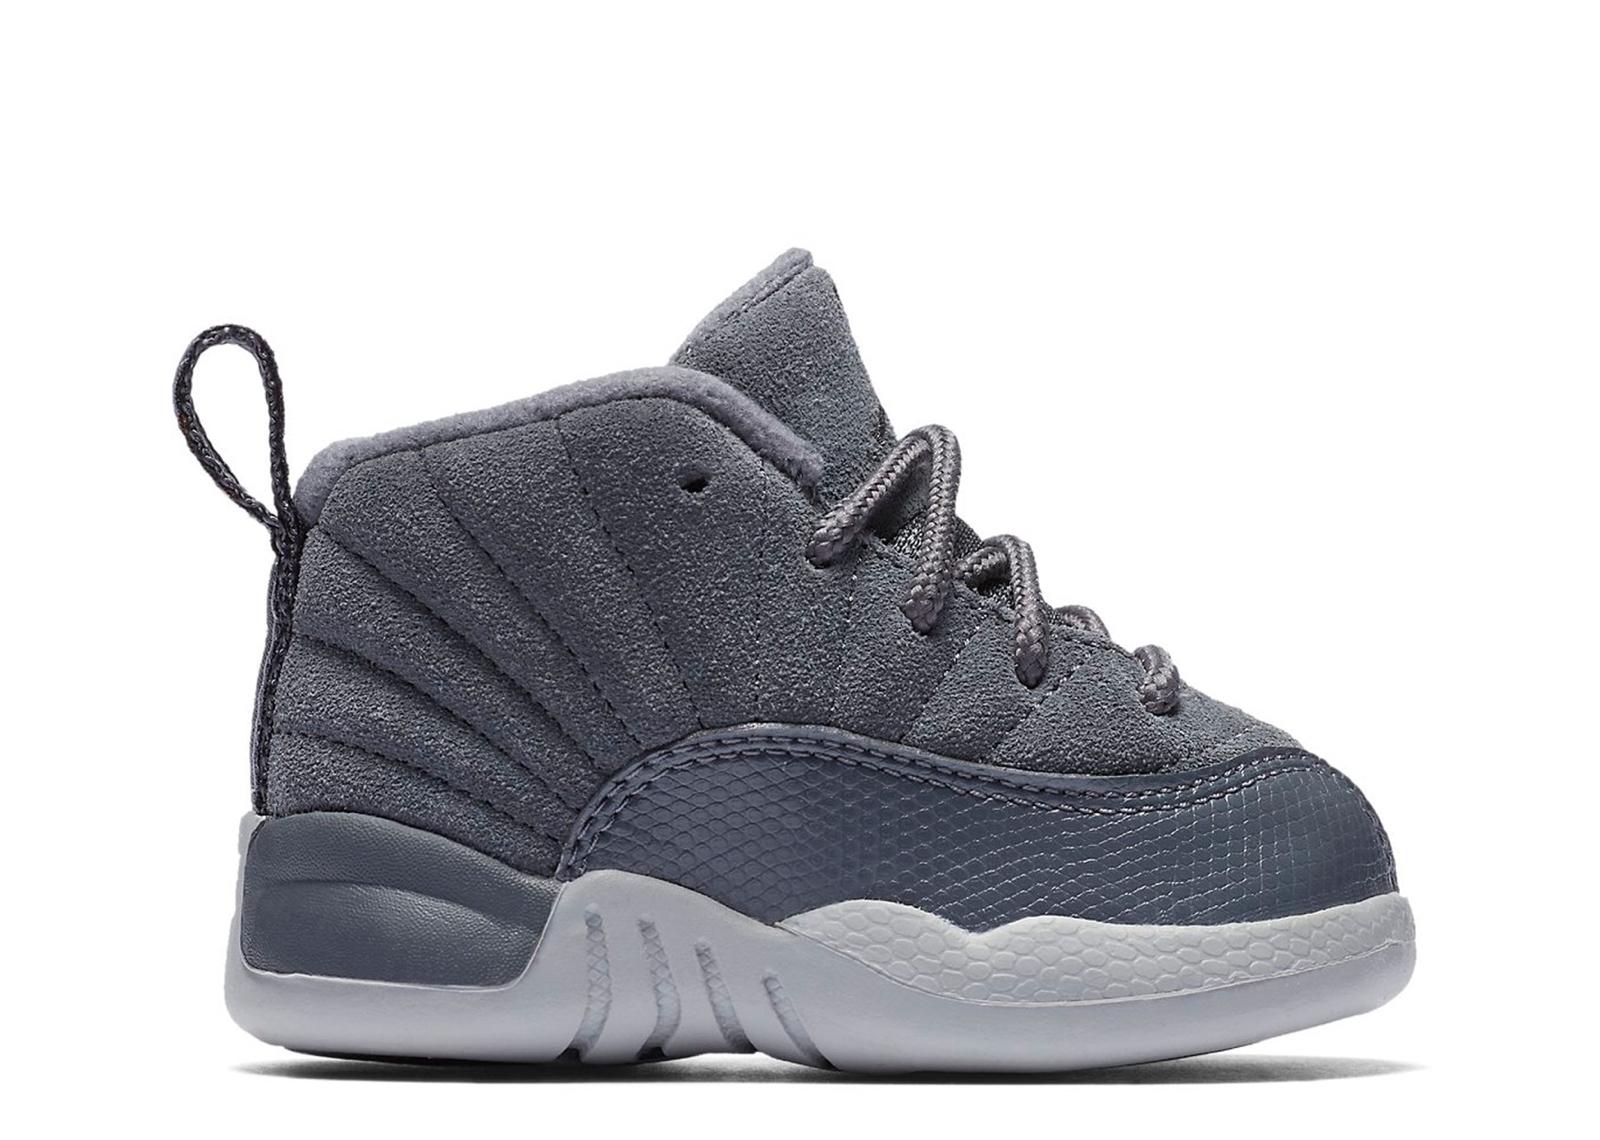 f1f83c094d8 Kick Avenue - Authentic Sneakers